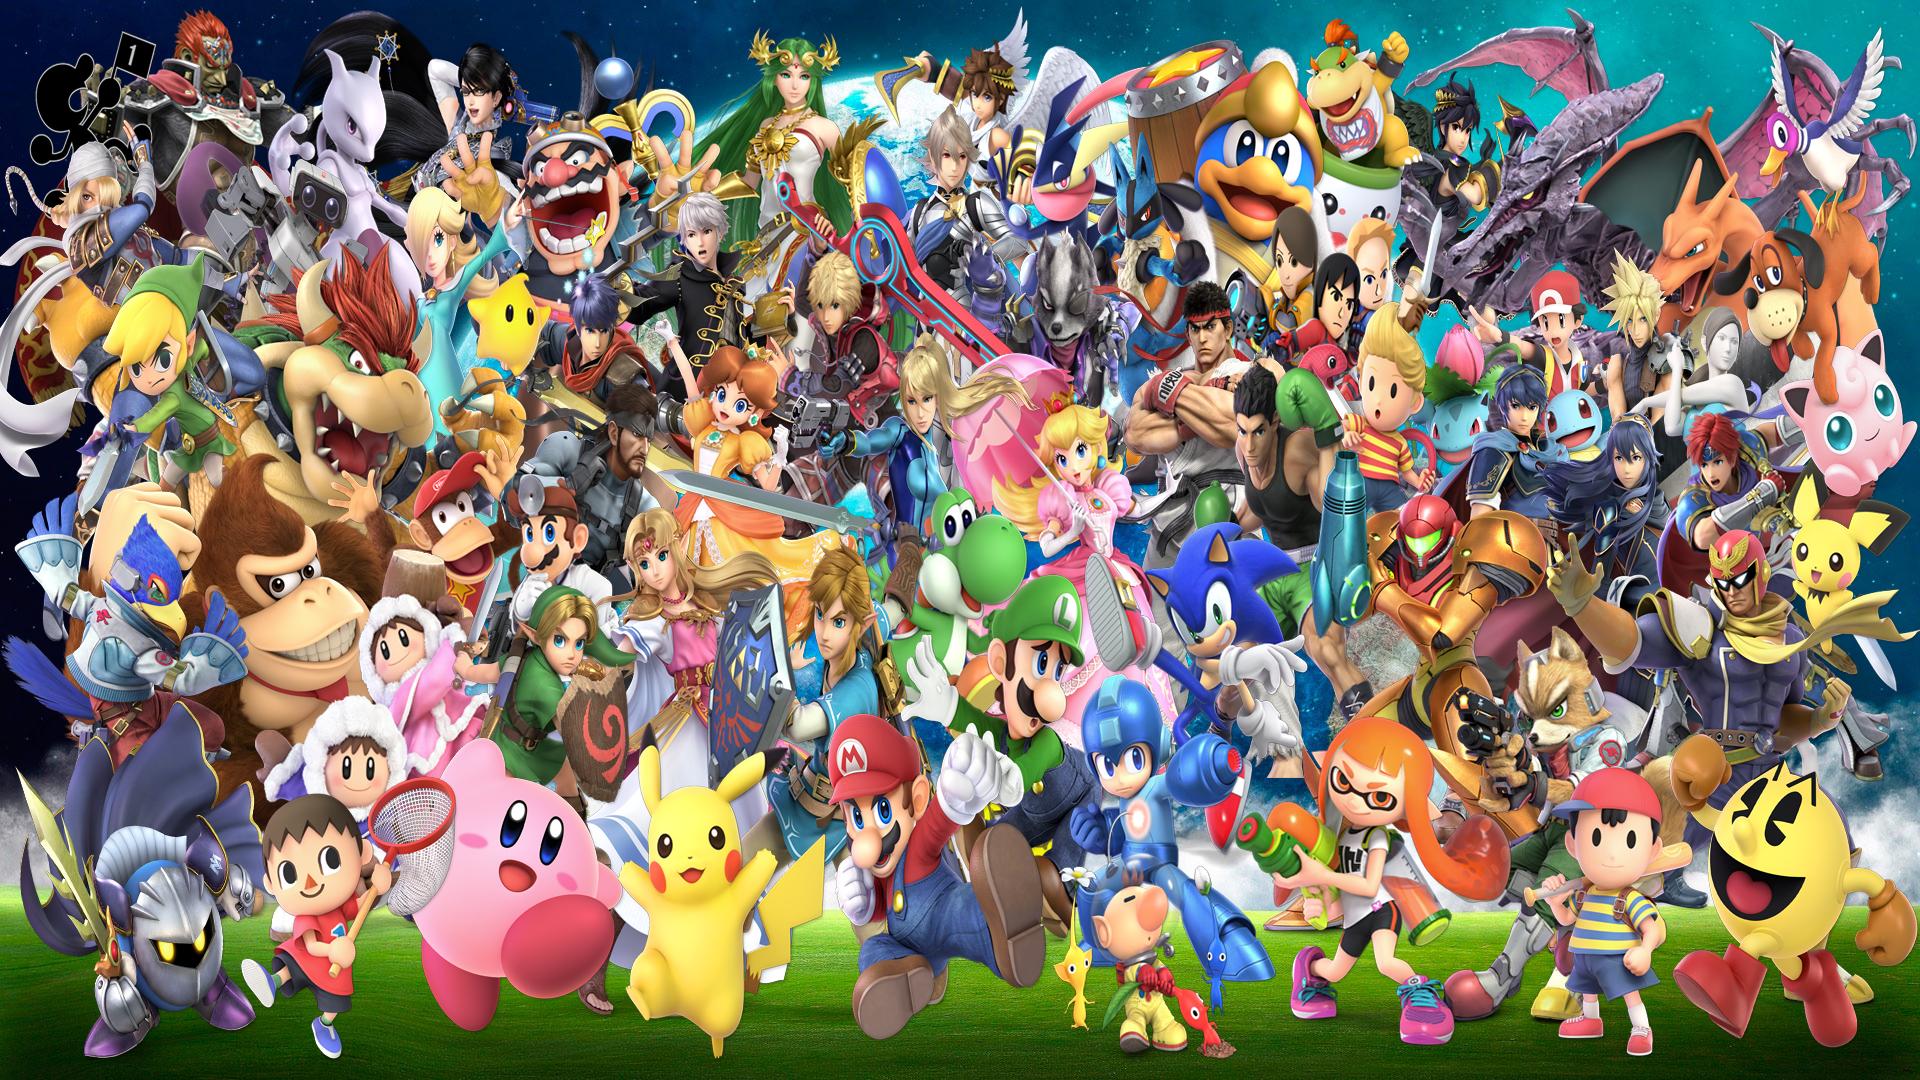 45 Smash Bros Ultimate Wallpapers On Wallpapersafari